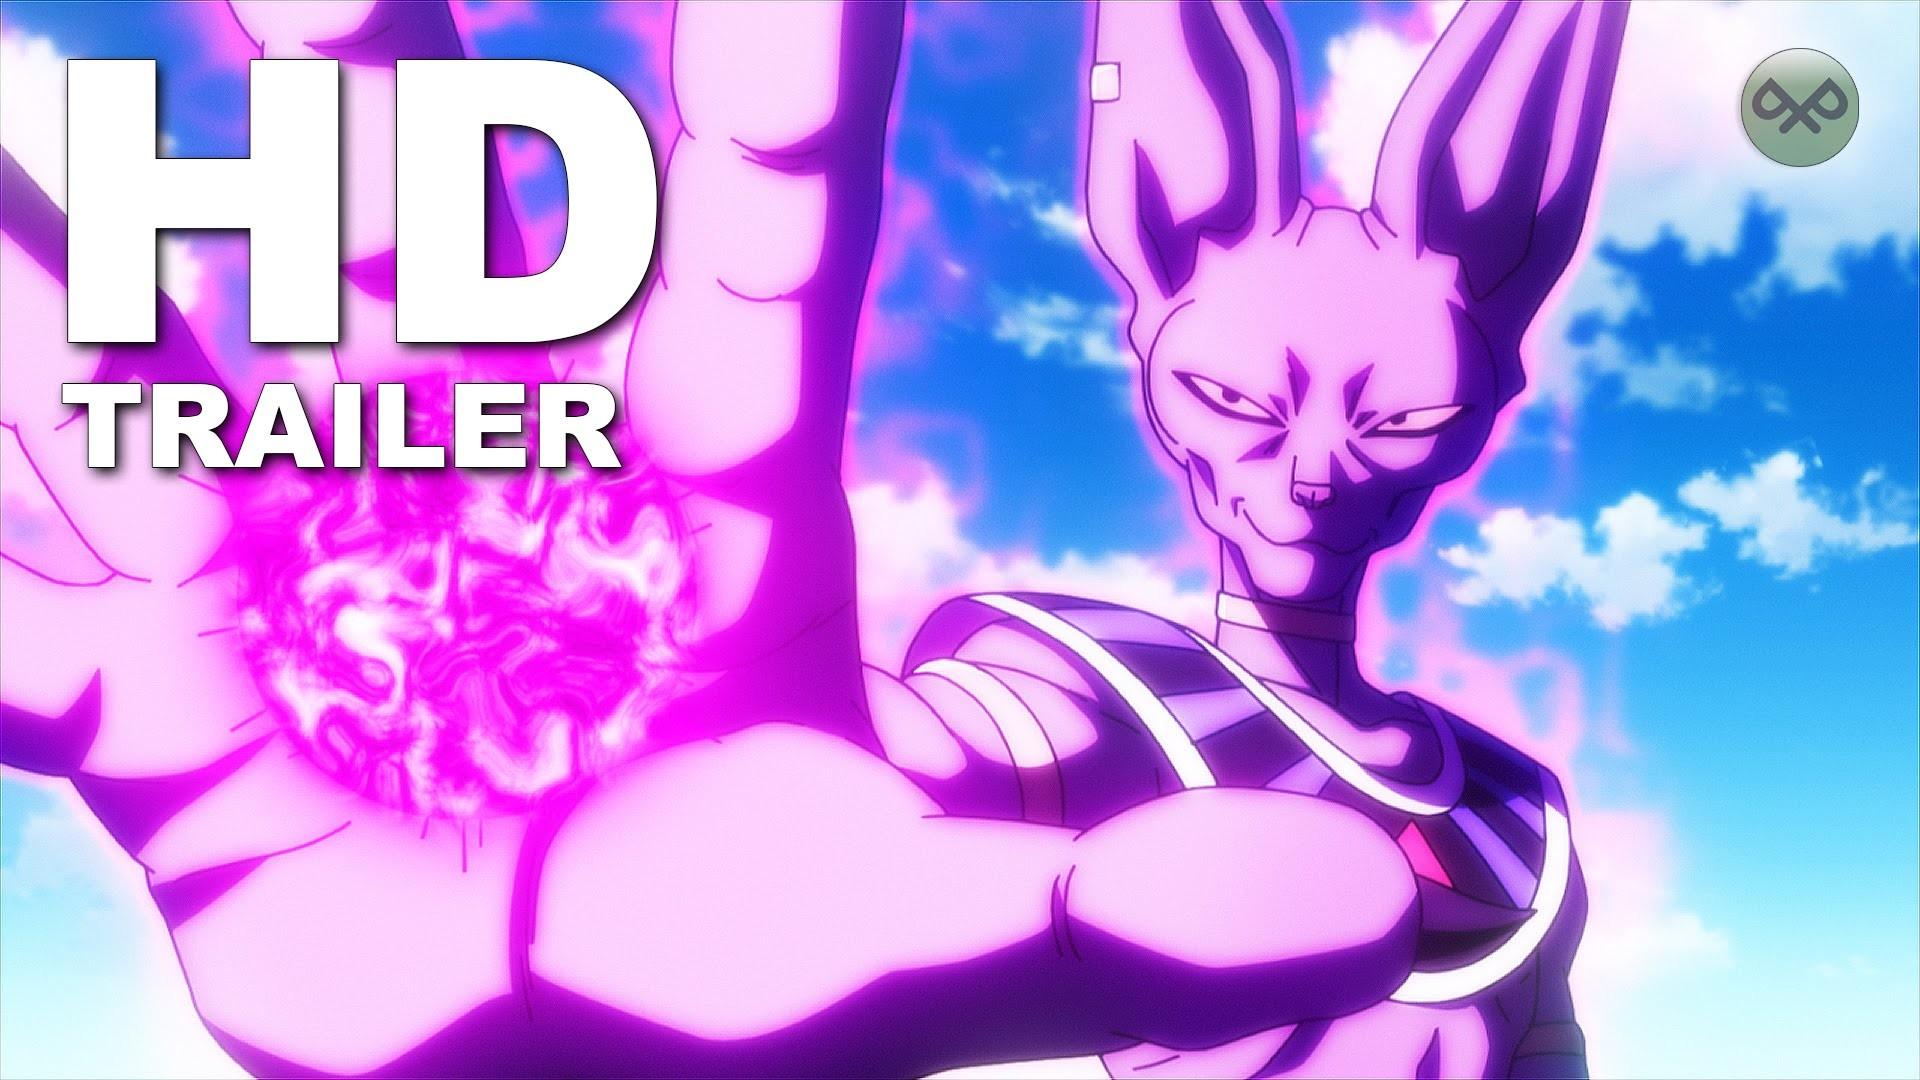 Dragon Ball Z – Fukkatsu no F Trailer – SSGSS vs Golden Frieza (spoiler)  (HD)